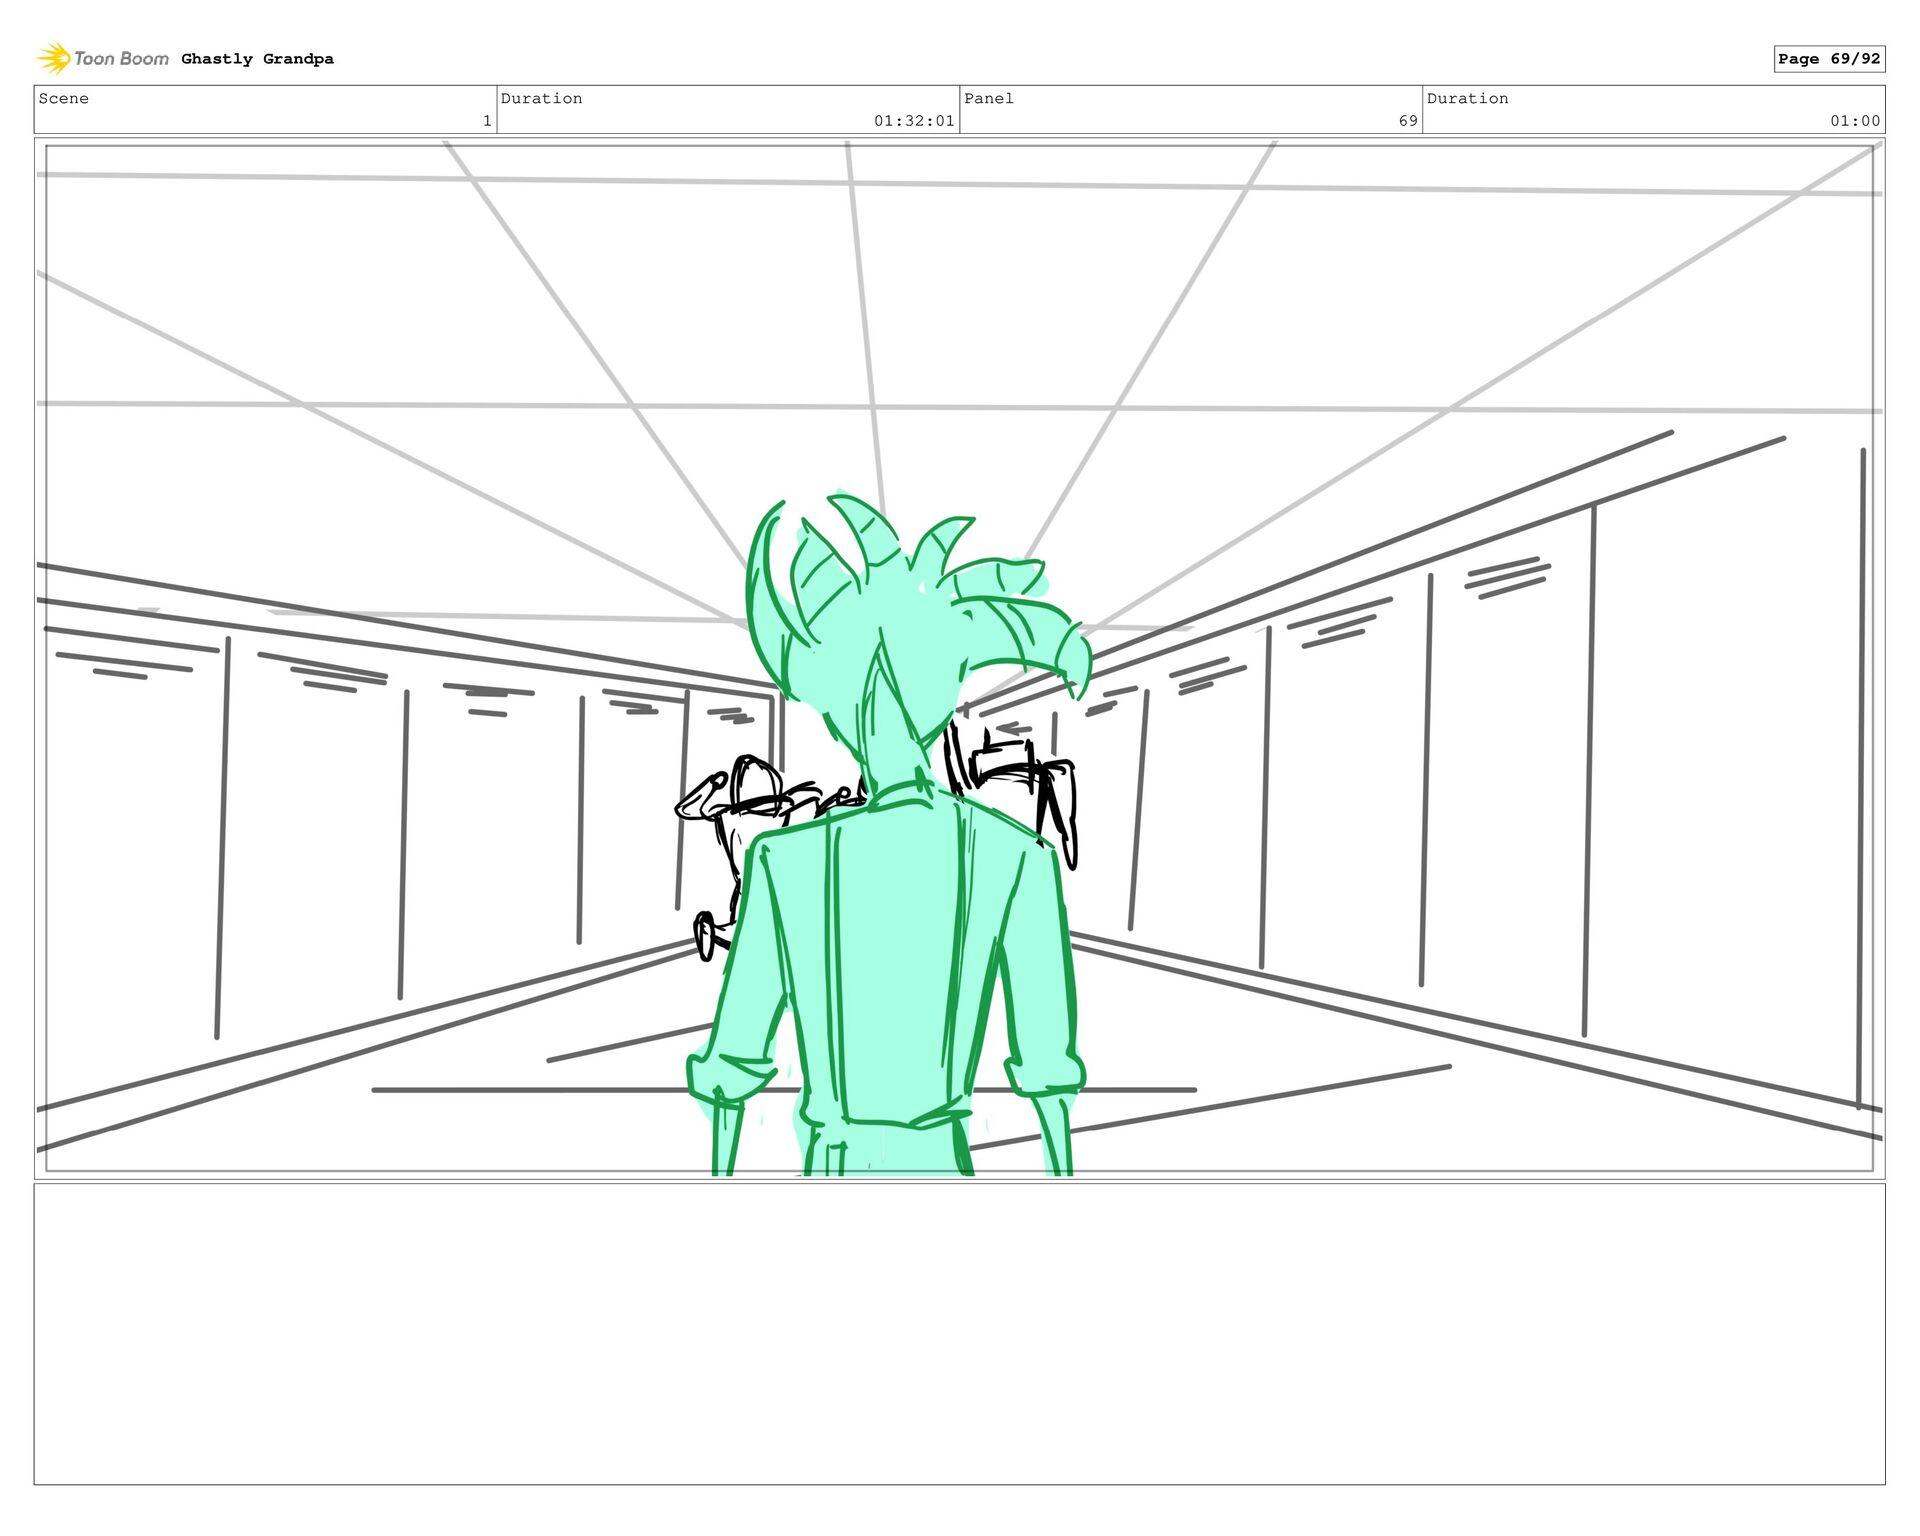 Scene 1 Duration 01:27:01 Panel 68 Duration 01:...